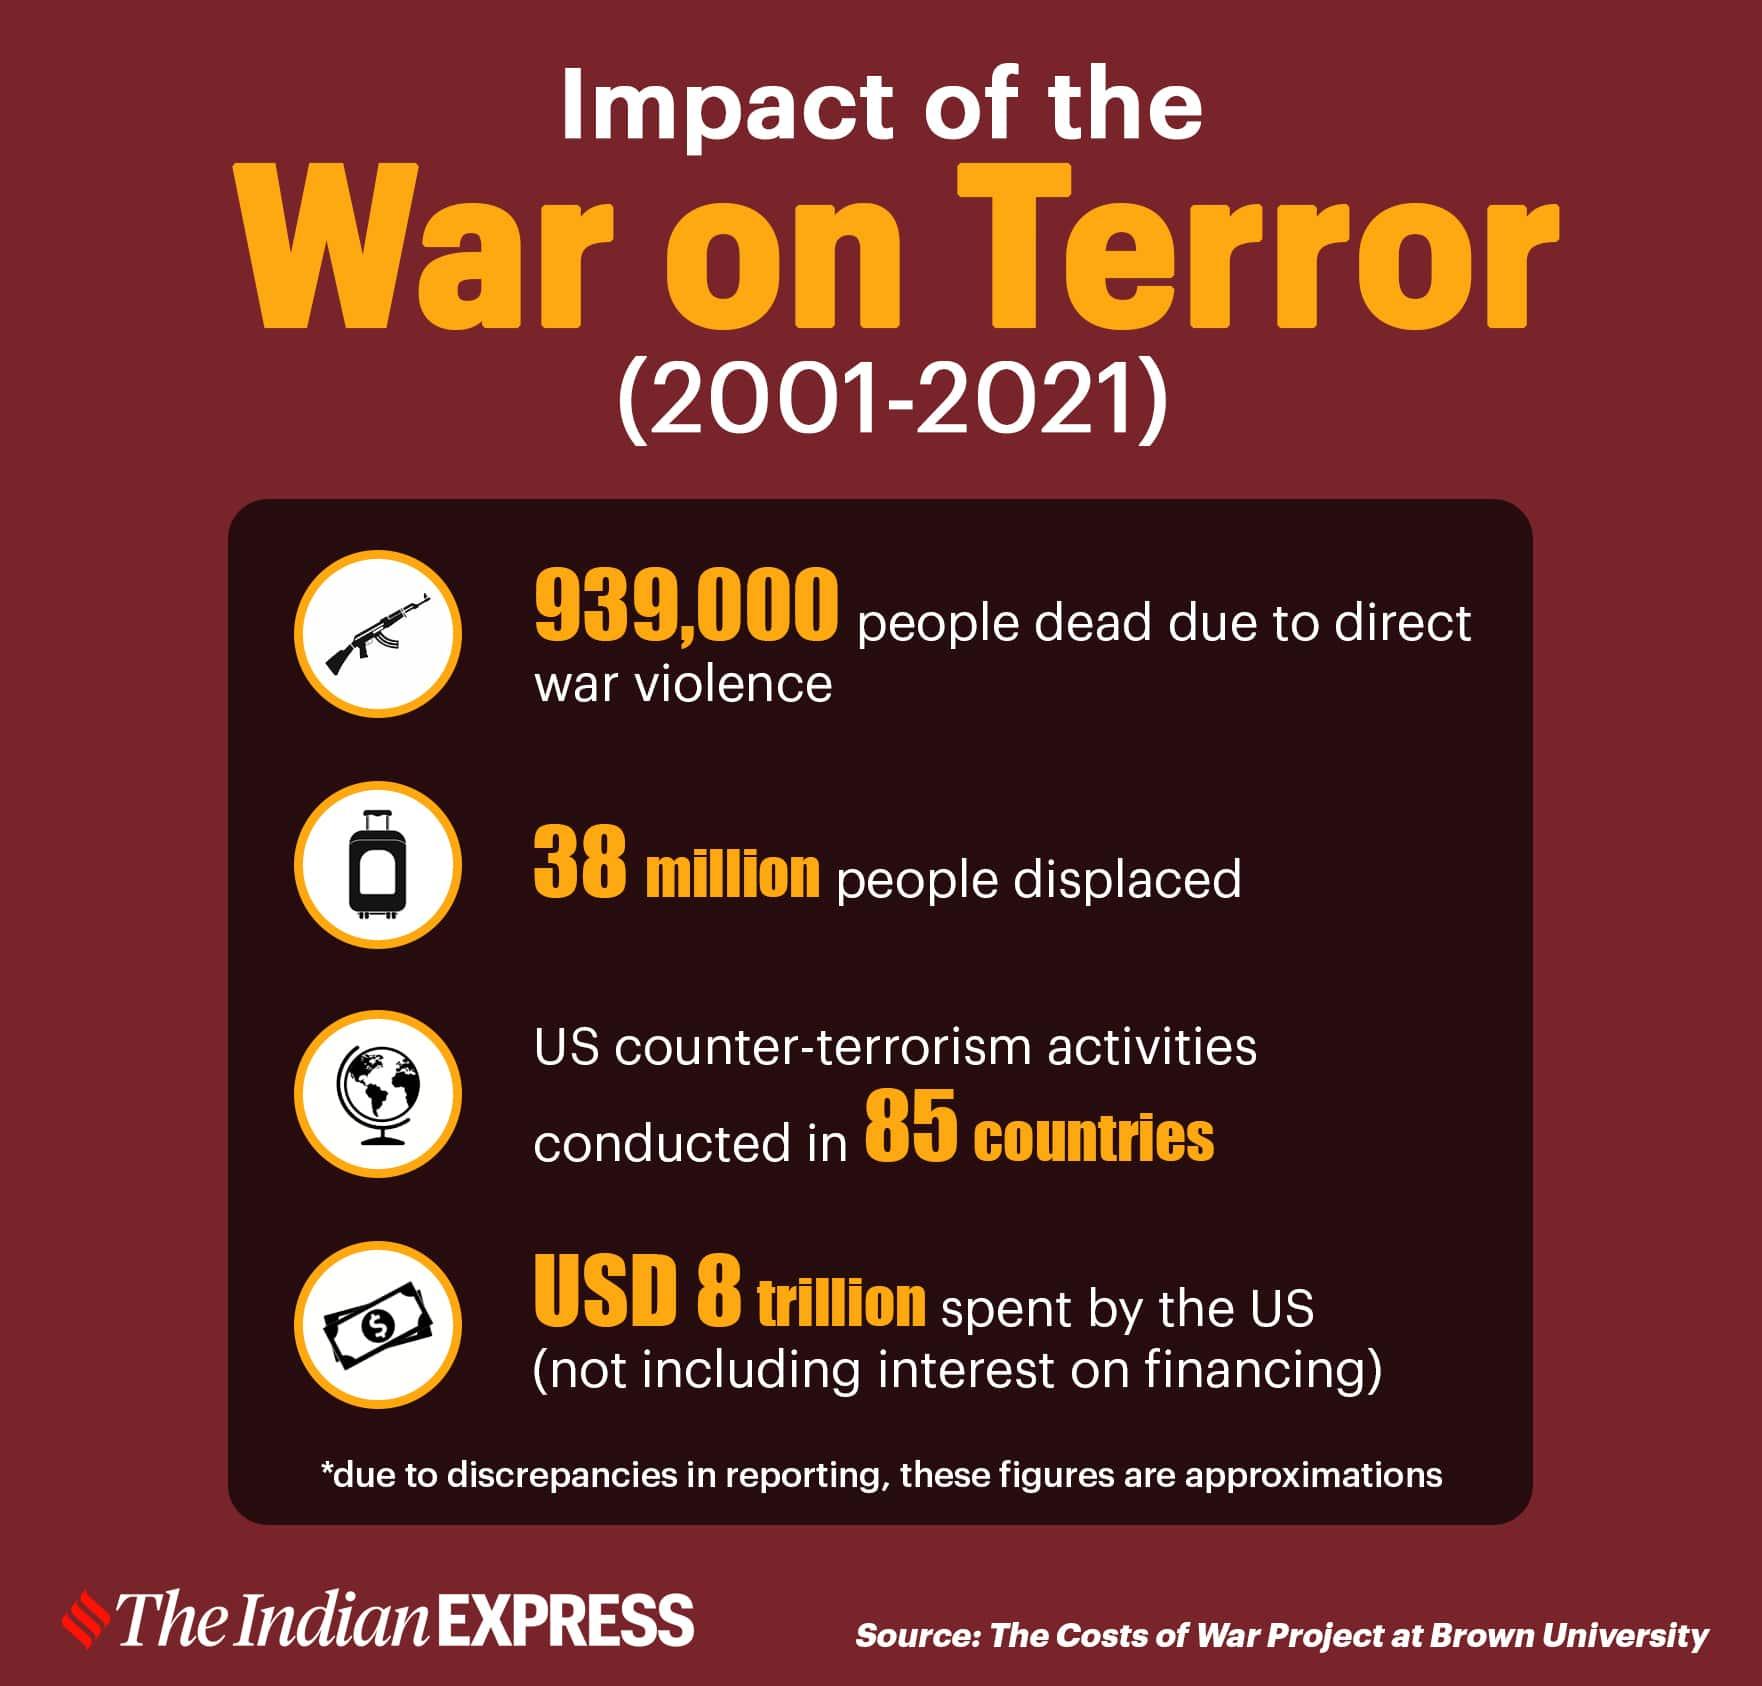 9/11, 9/11 anniversary, 9/11 twenty years, 20th anniversary of 9/11. 9/11 anniversary 2021, september 11, al qaeda, terrorism, afghanistan, taliban, iraq, war on terror, terrorist attack, world trade center, new york attack, plane crash, anti-terrorism, cost of war on terror, us, america war, islamic state, taliban, islamaphobia, foreign policy,